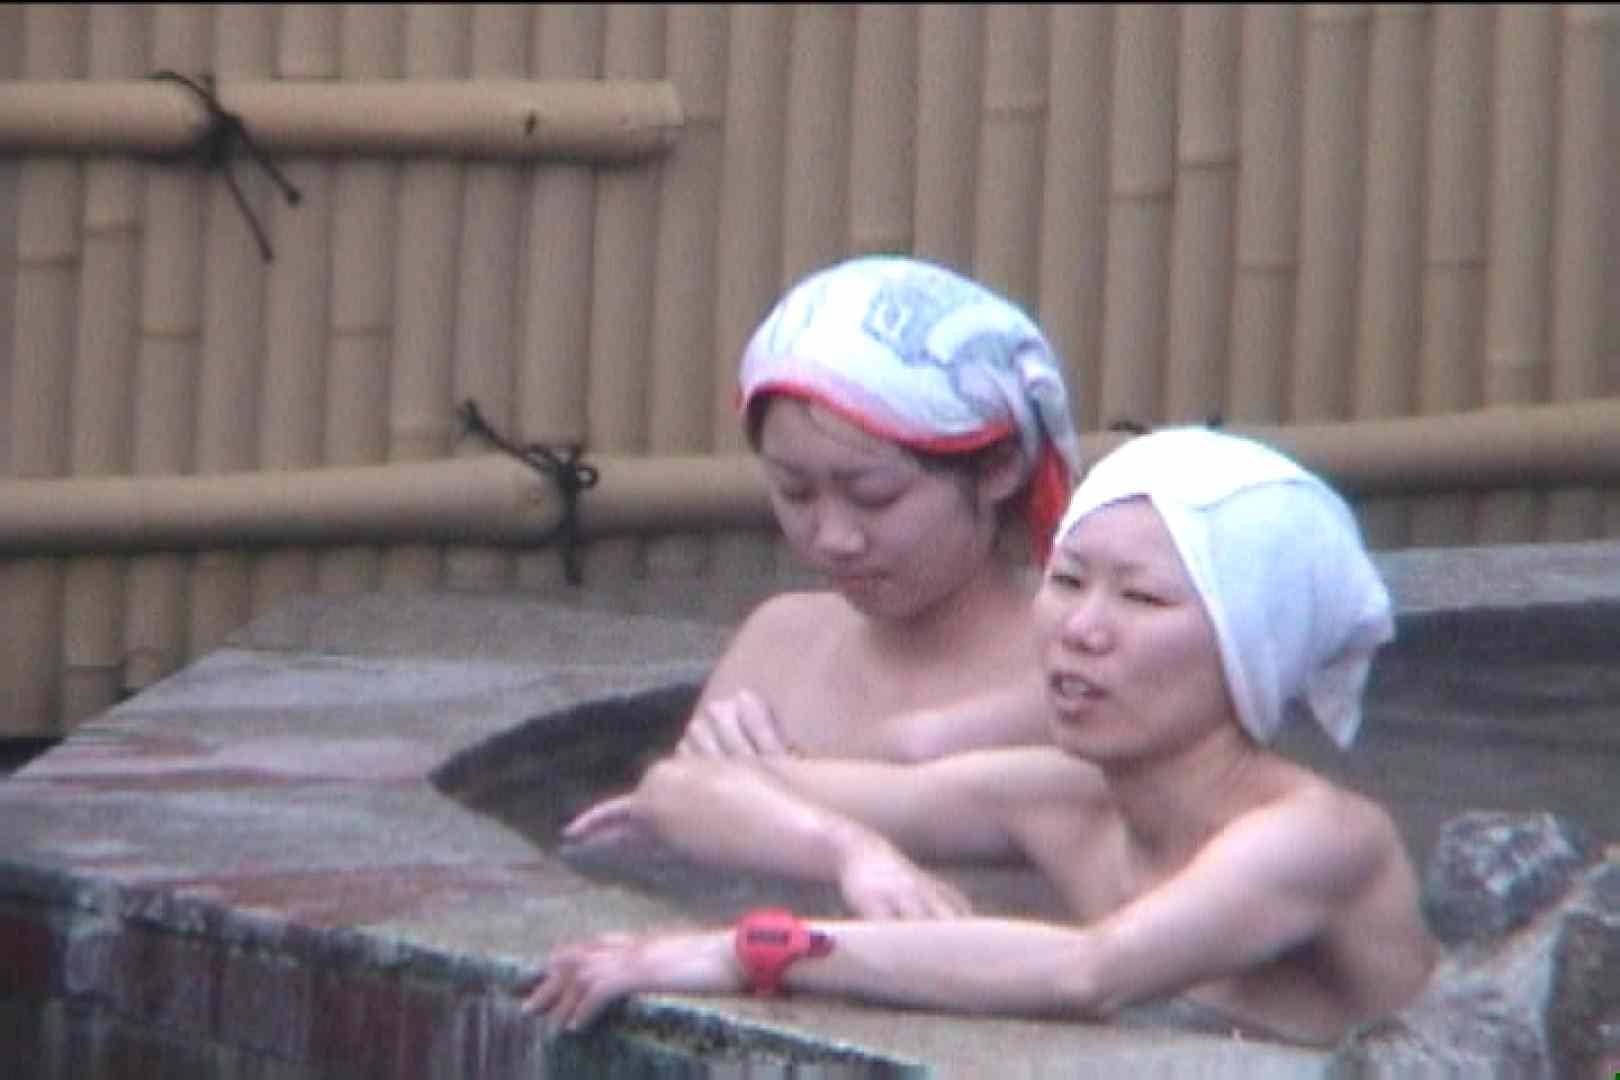 Aquaな露天風呂Vol.91【VIP限定】 盗撮シリーズ | 露天風呂編  99PIX 35